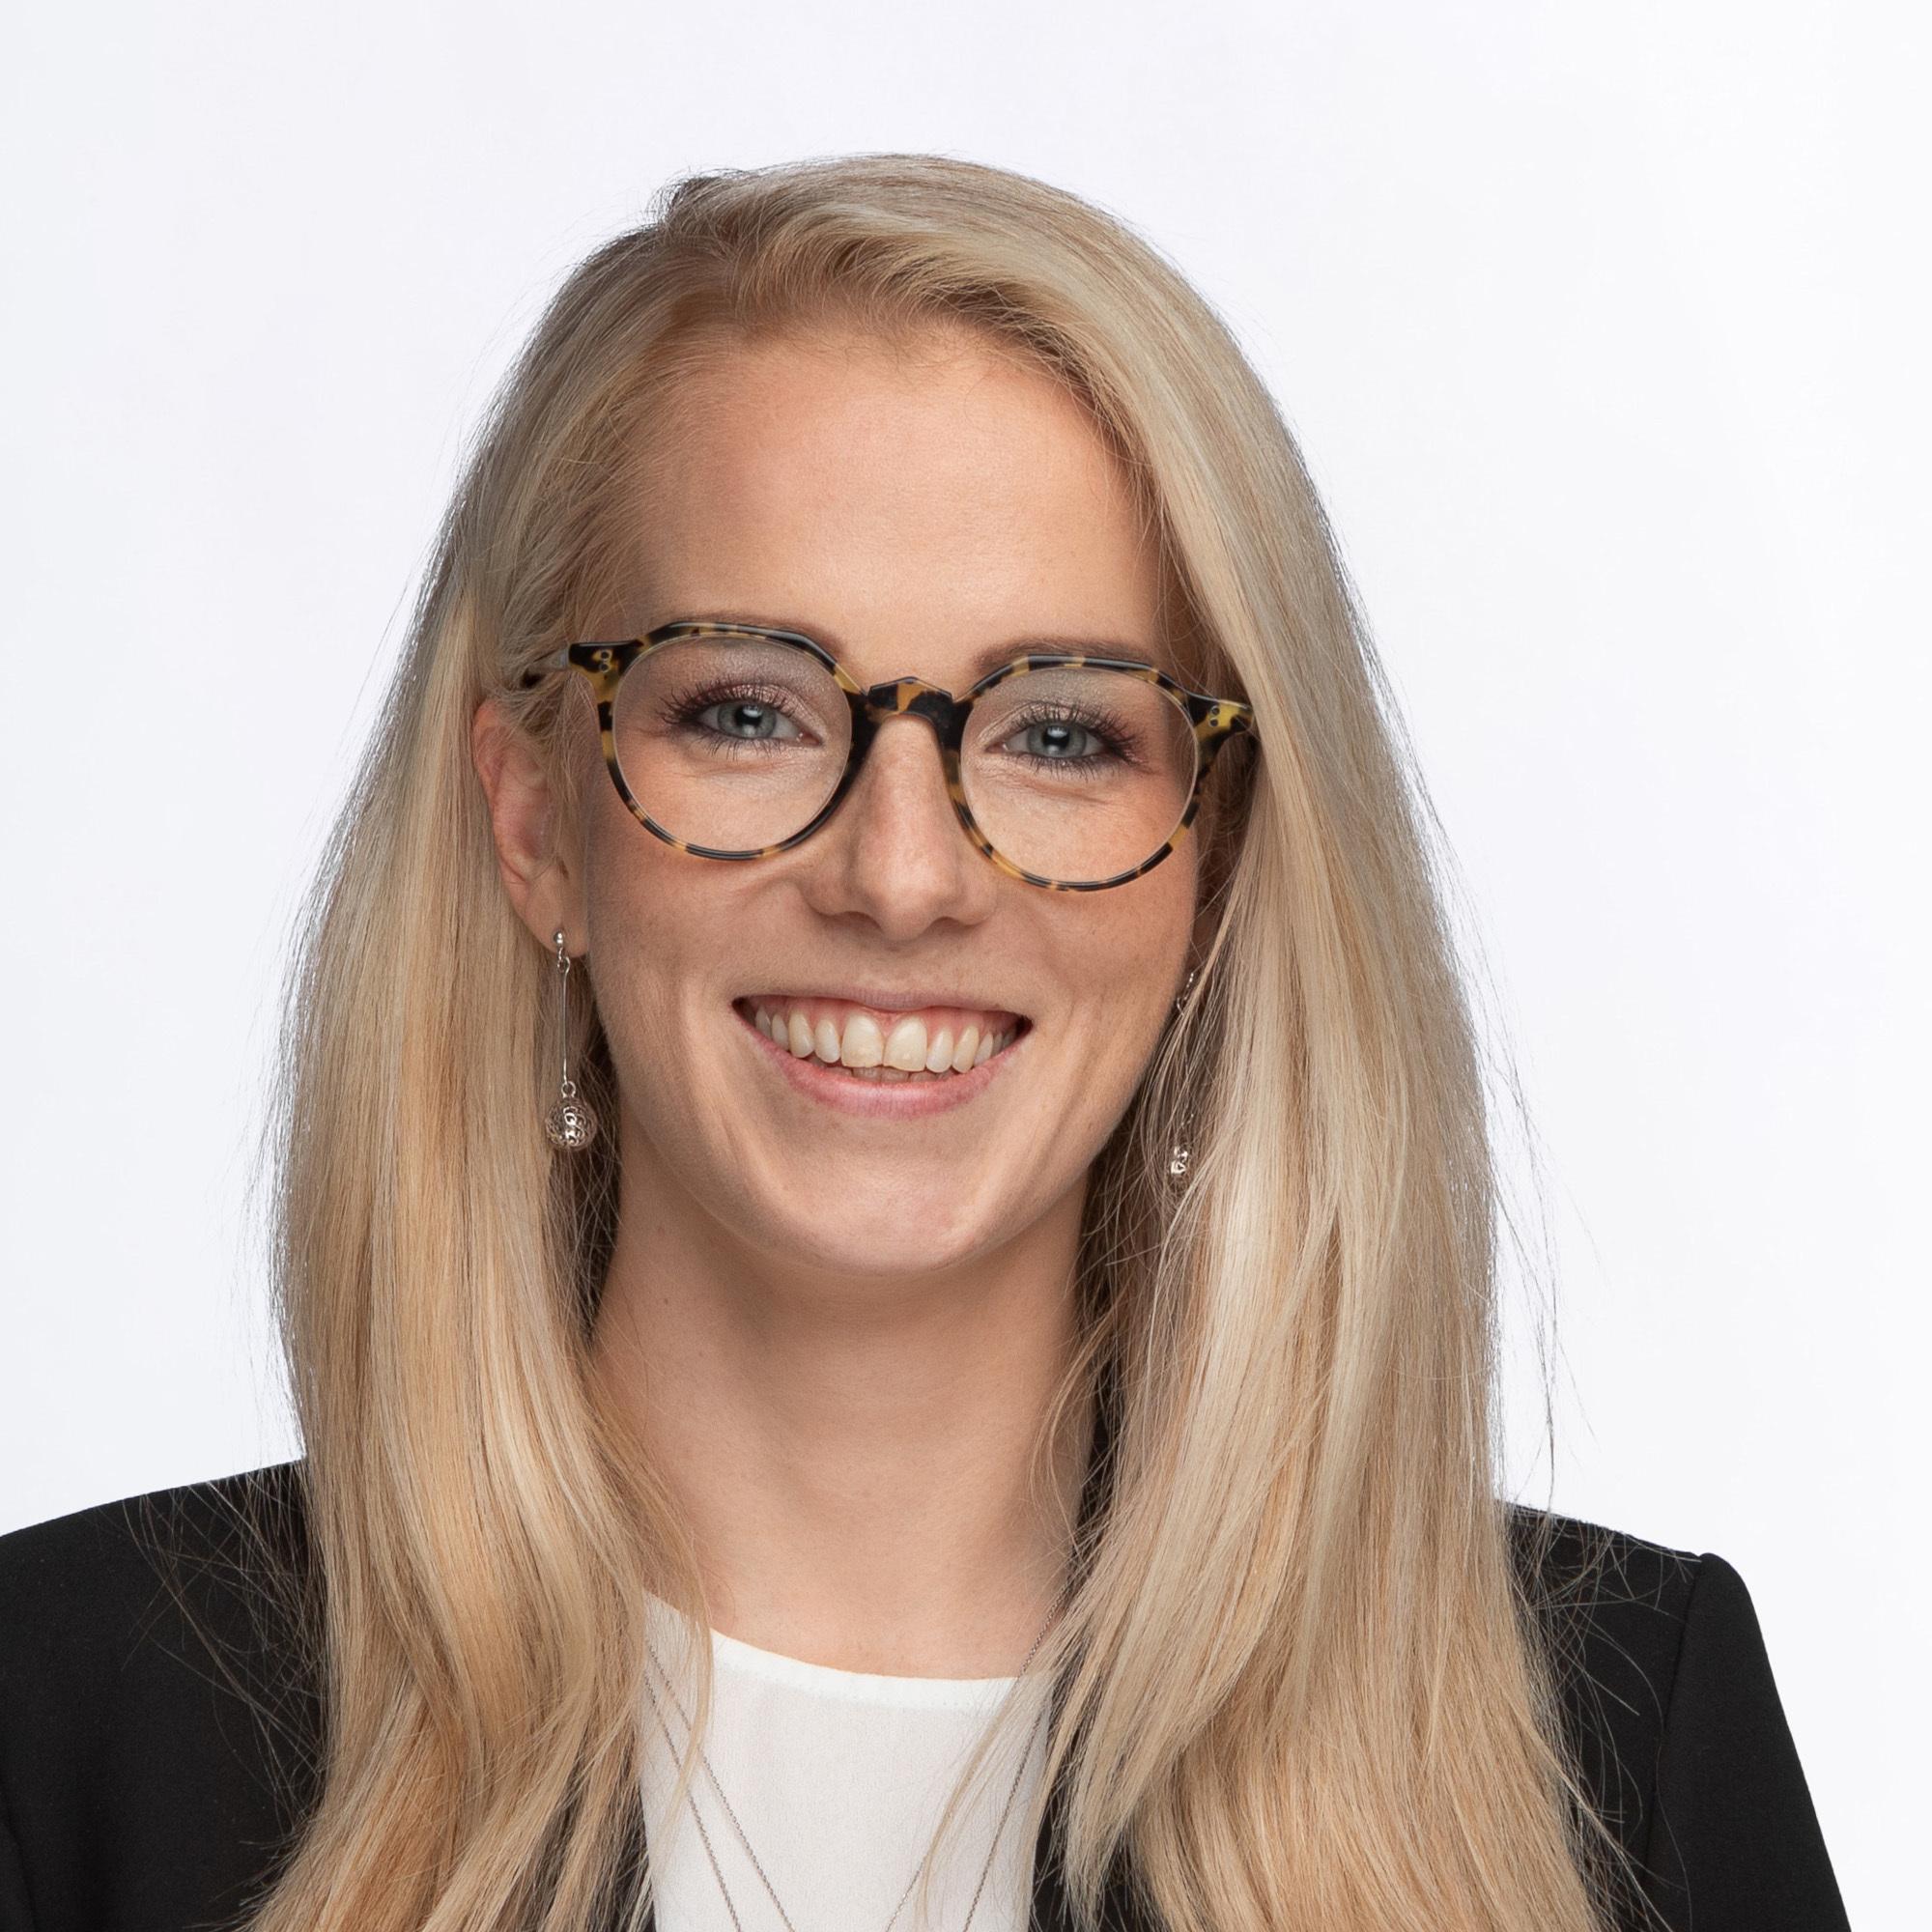 Pernille Stein Engvoll website